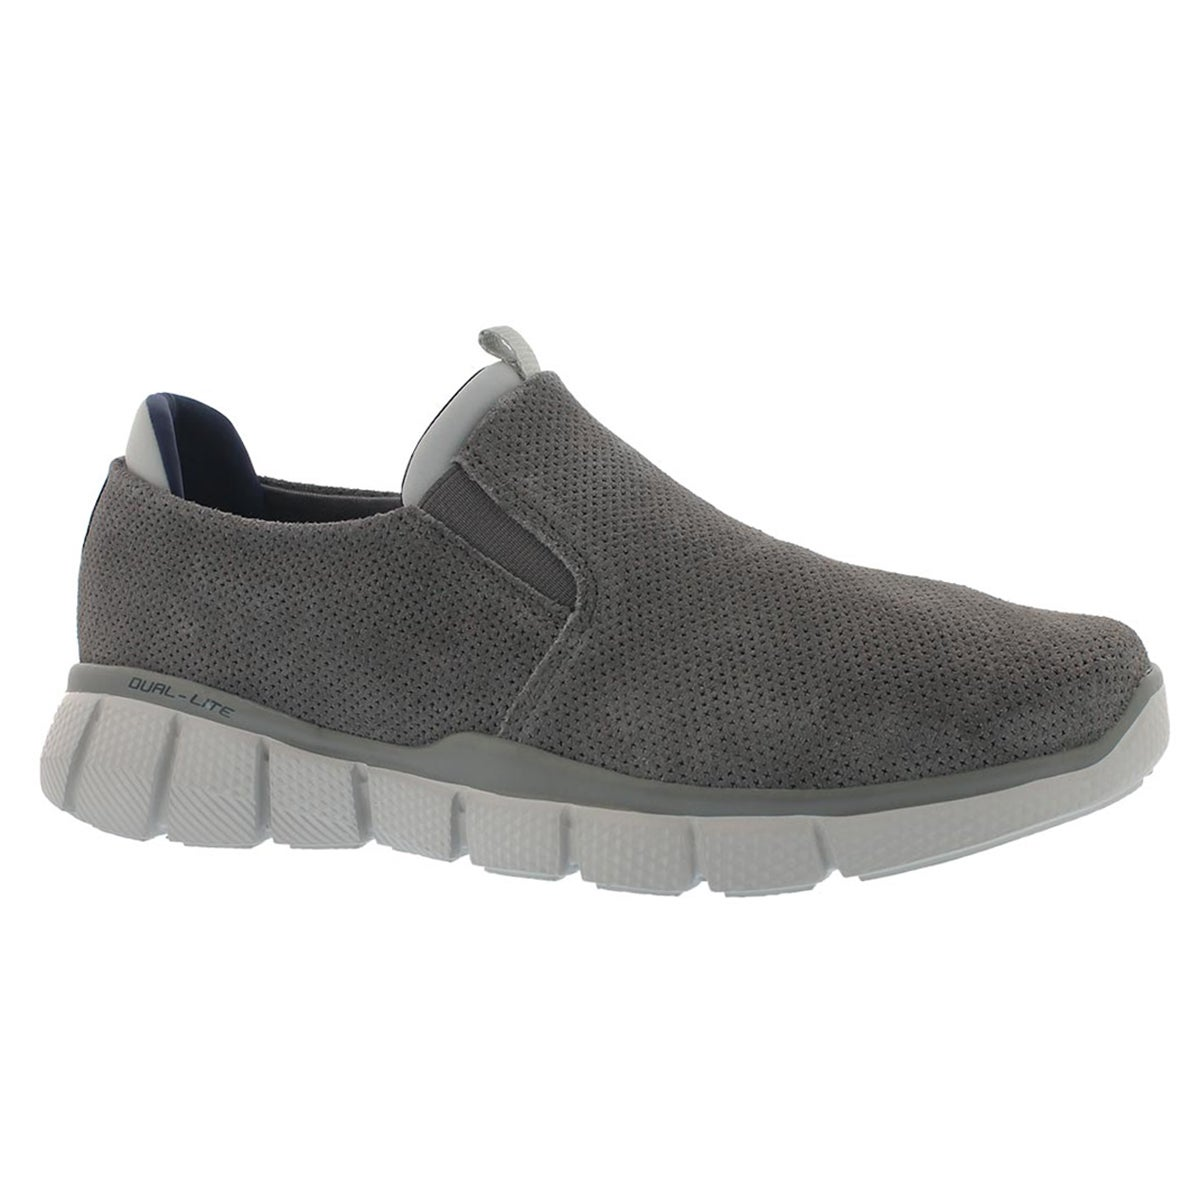 Men's EQUALIZE 2.0 charcoal slip on shoes